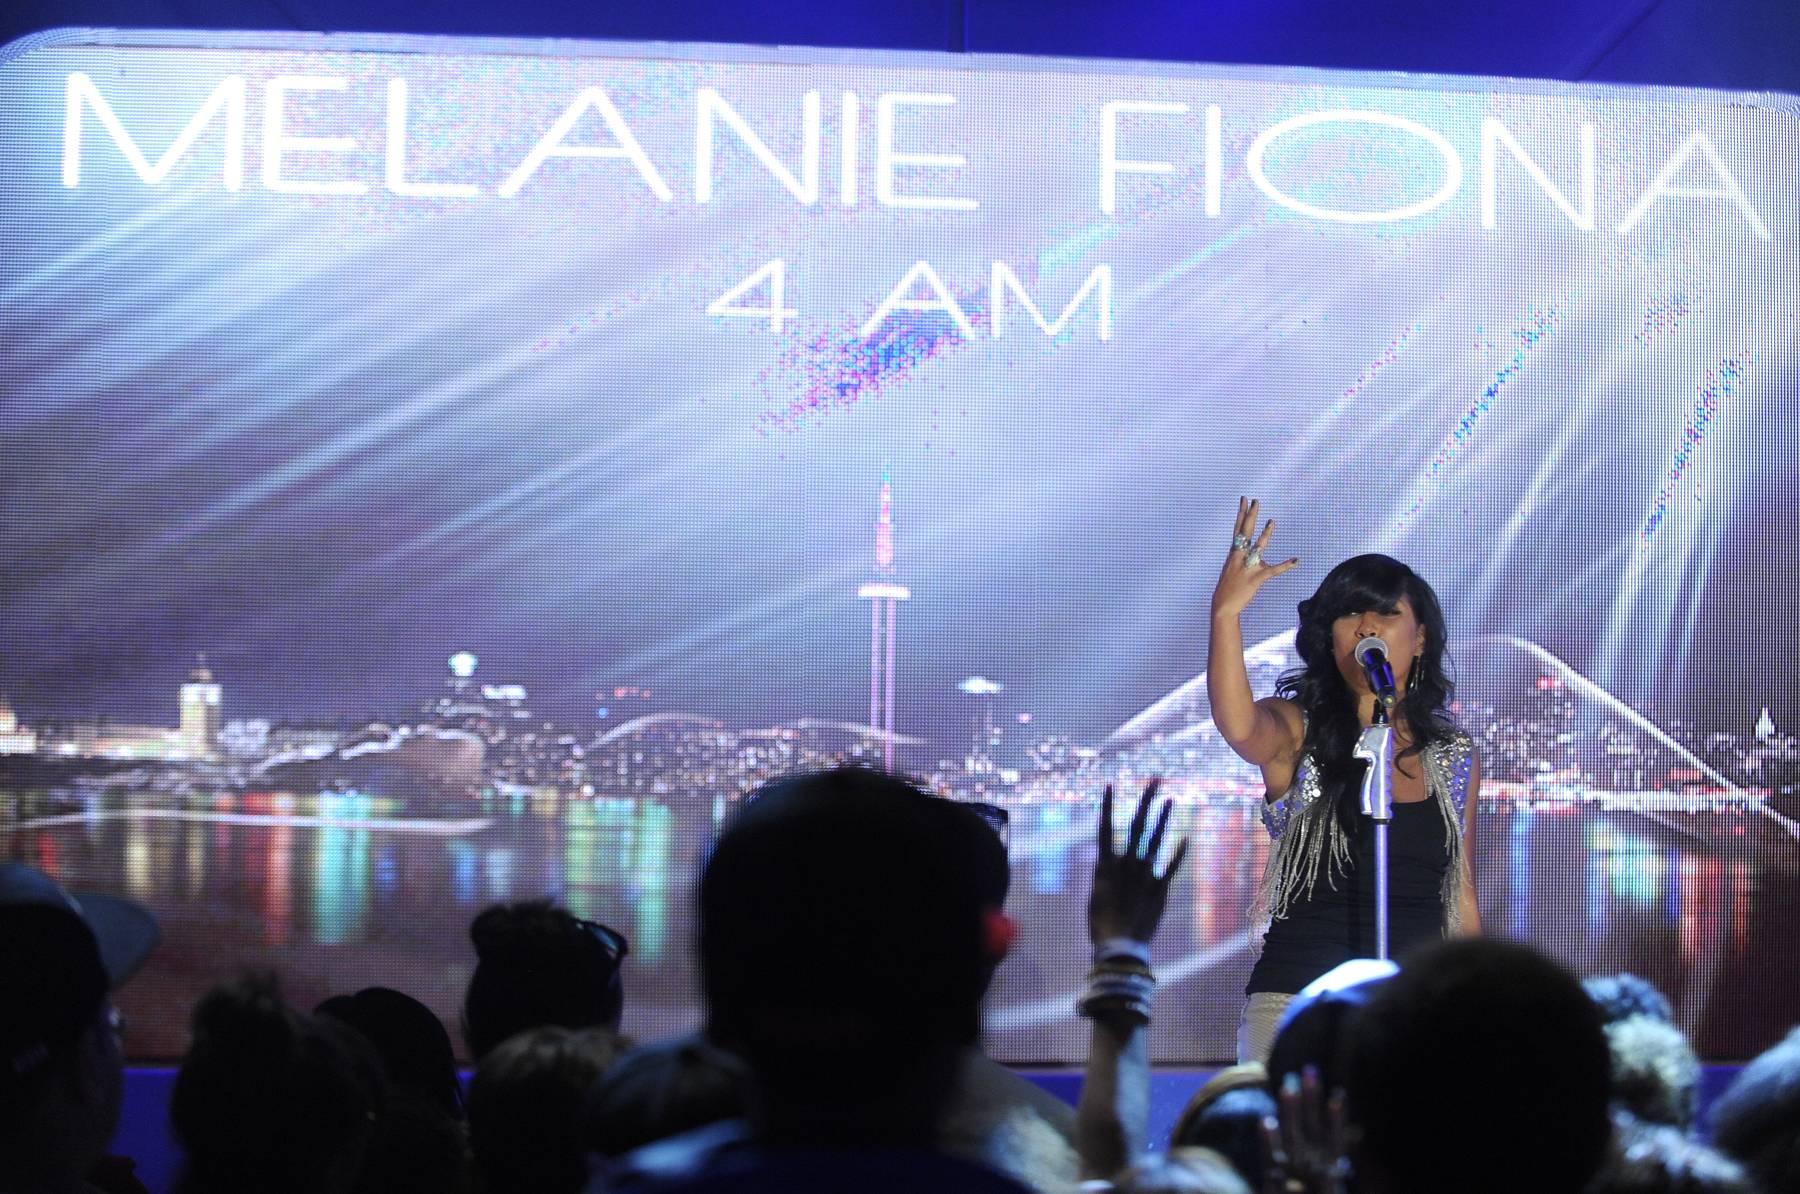 """4 AM"" - Melanie Fiona performs at 106 & Park, May 22, 2012. (Photo: John Ricard / BET)"